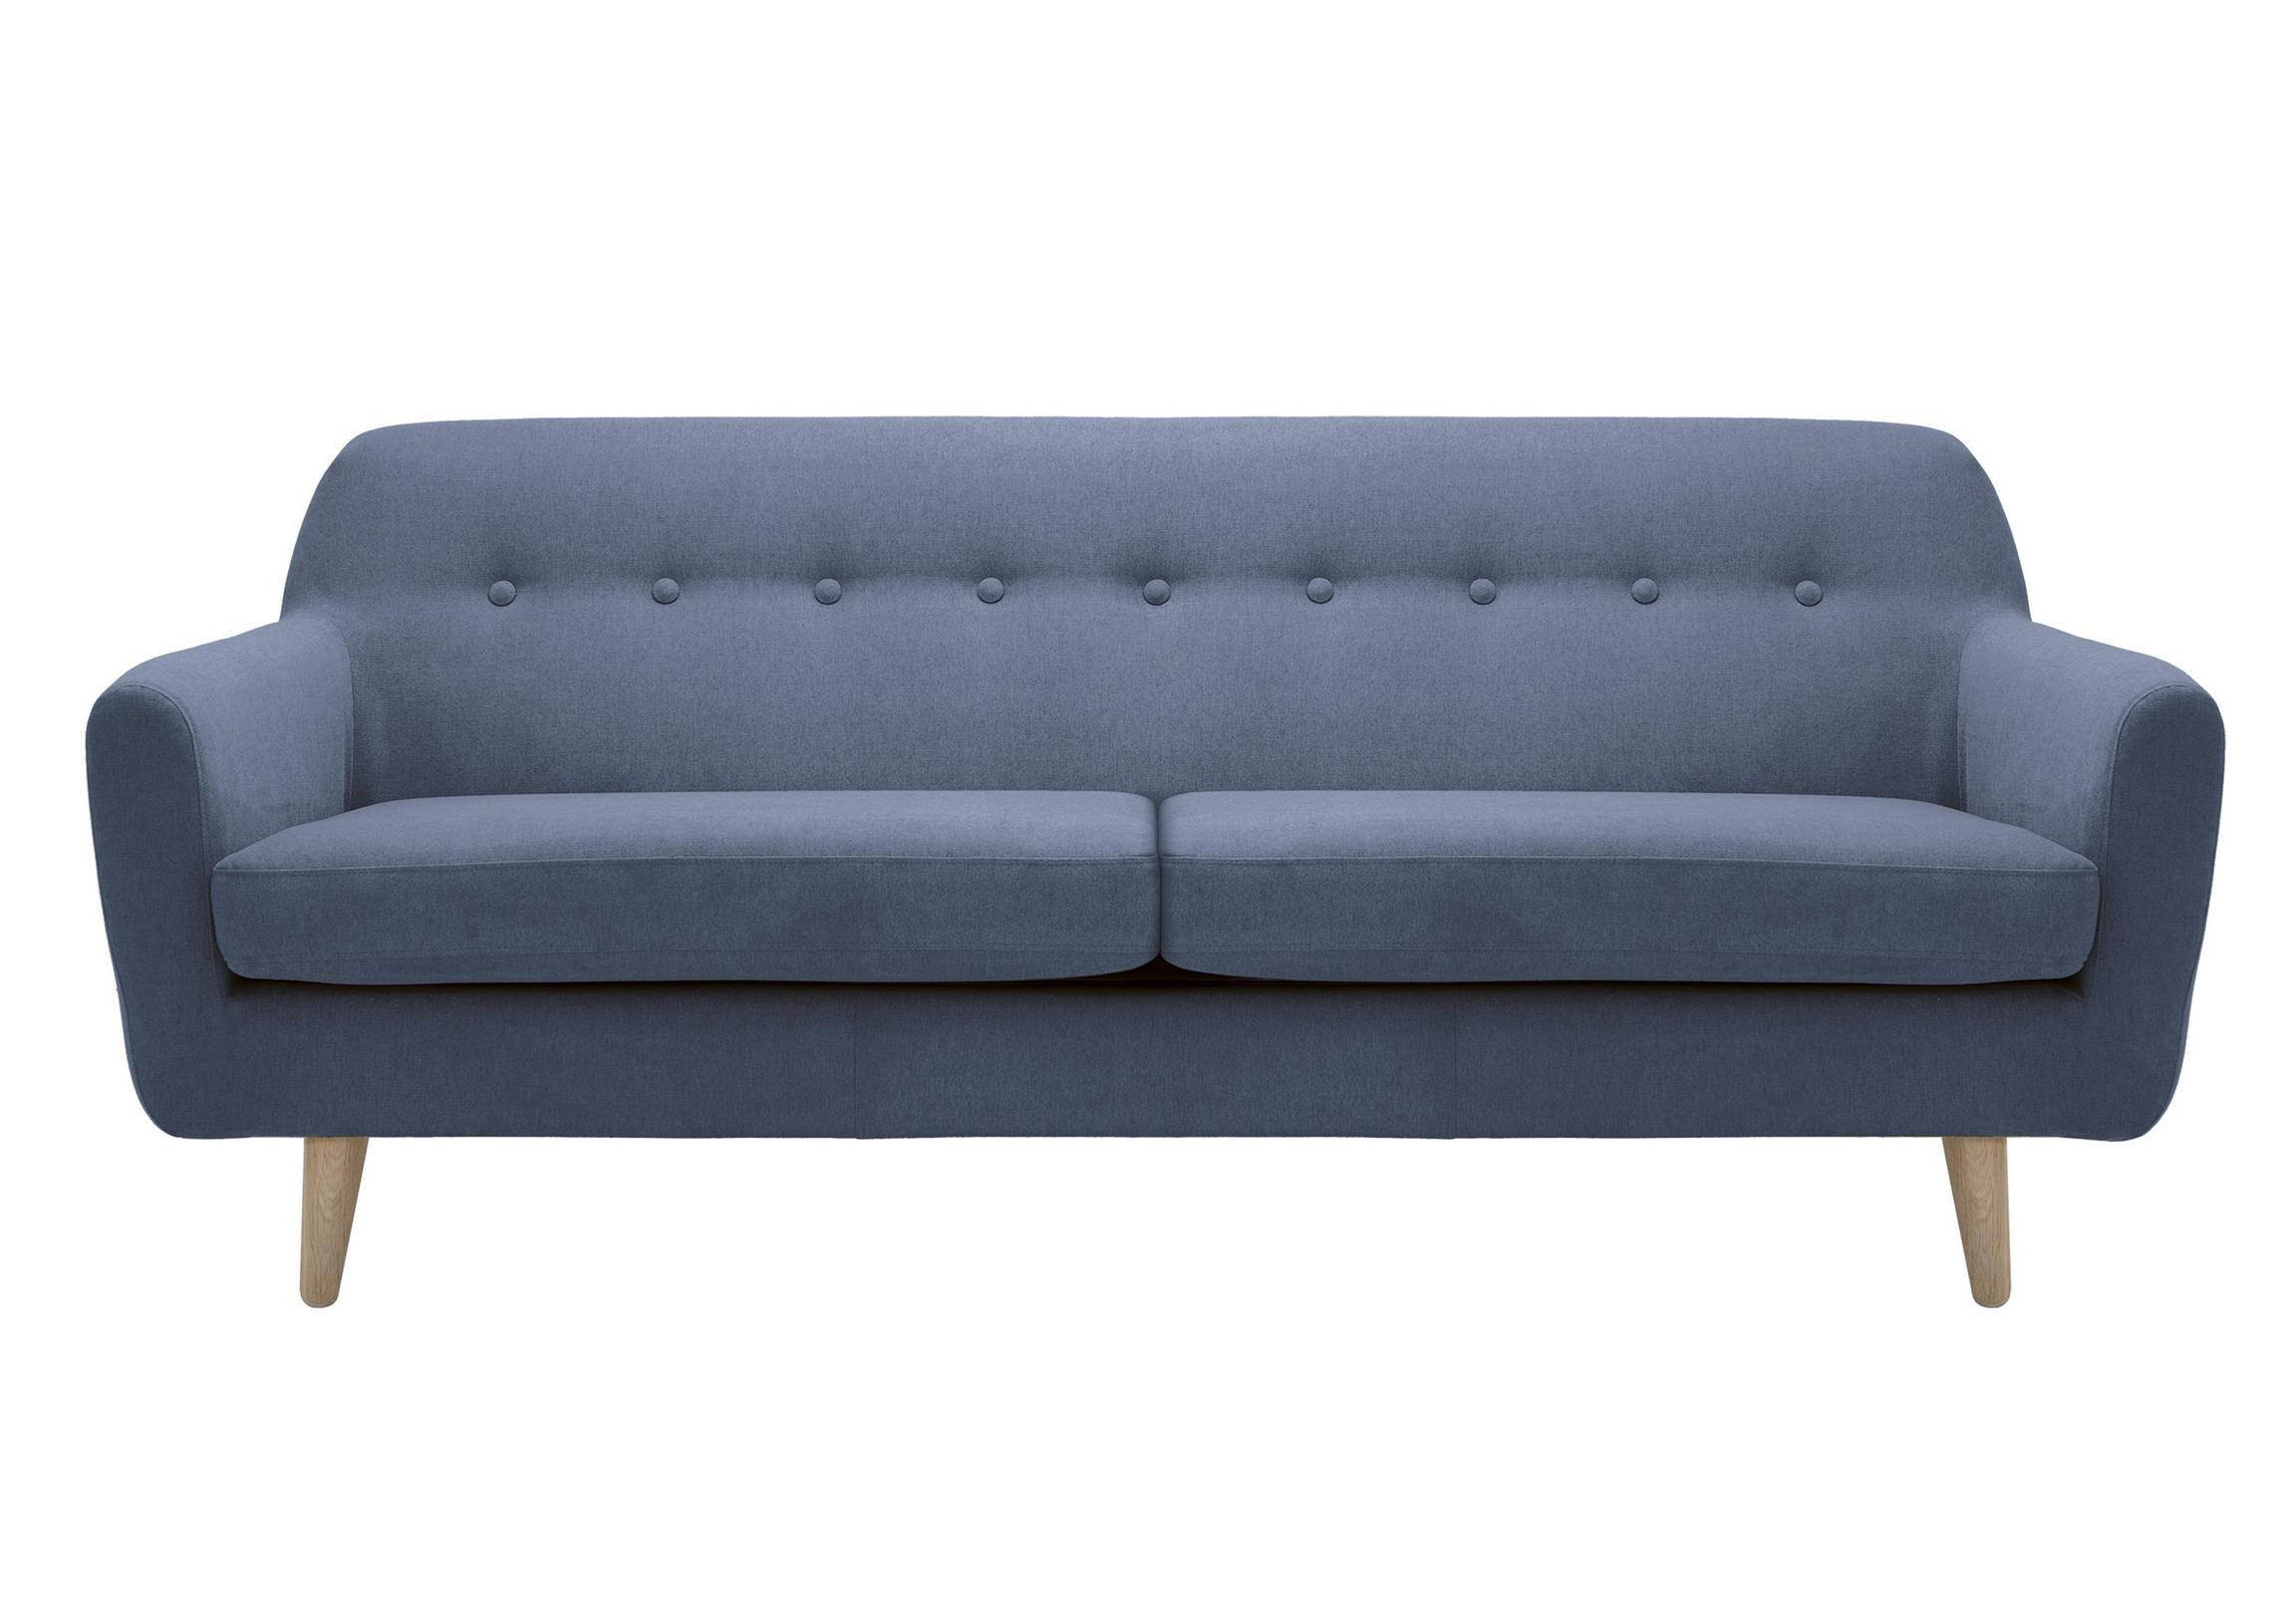 Leather Sectional Sofa Casper Seater Fabric Sofa Sale Furniture Village